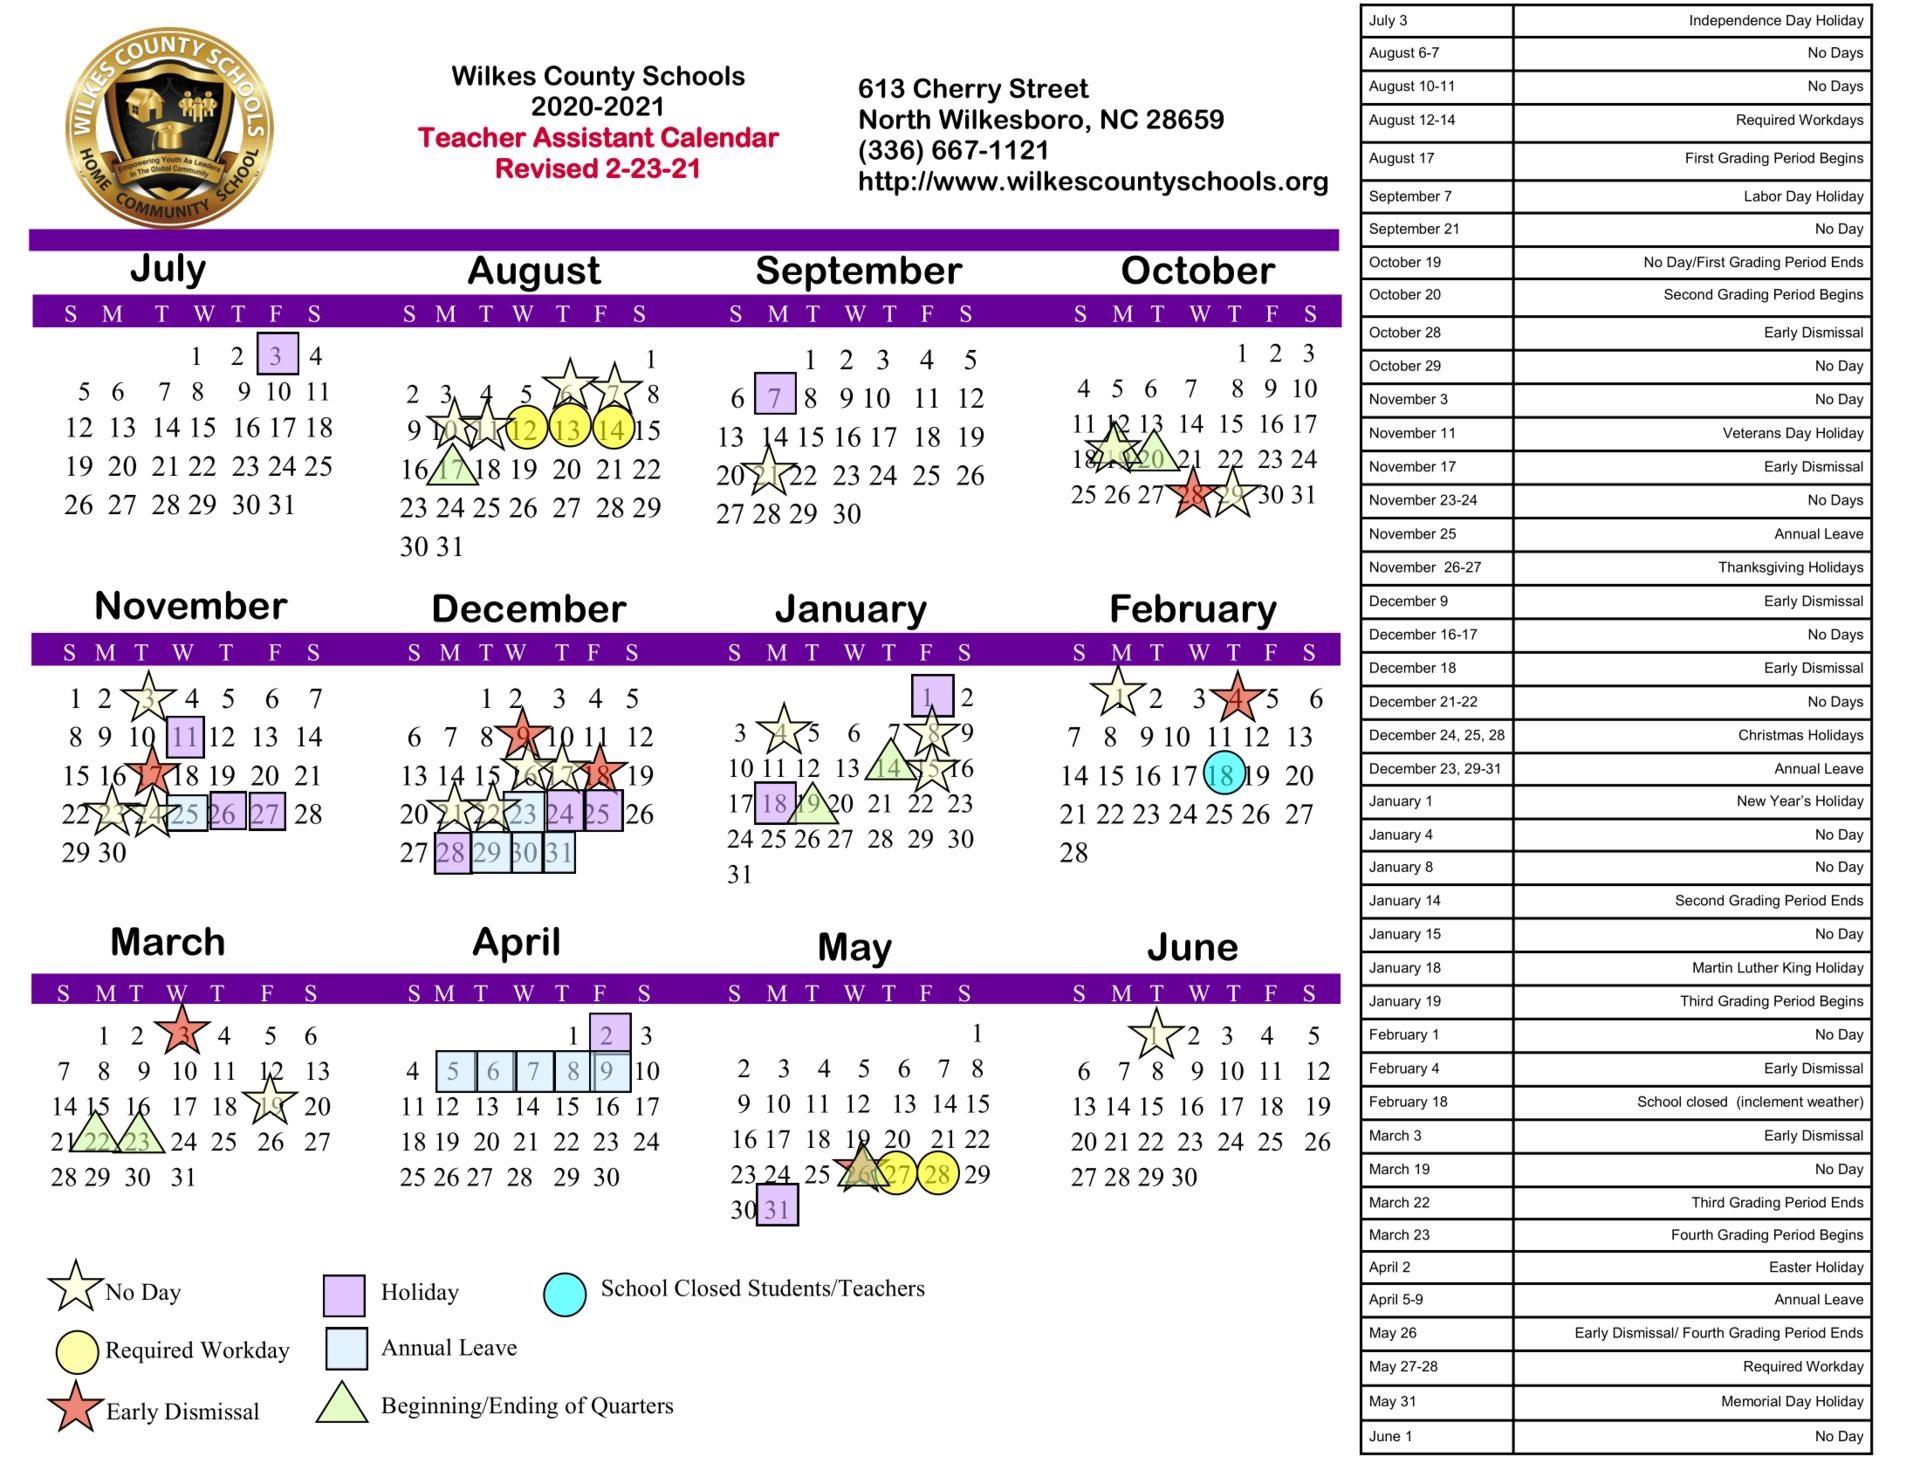 2020-2021 Teacher Assistant Calendar (Revised February 23, 2021)